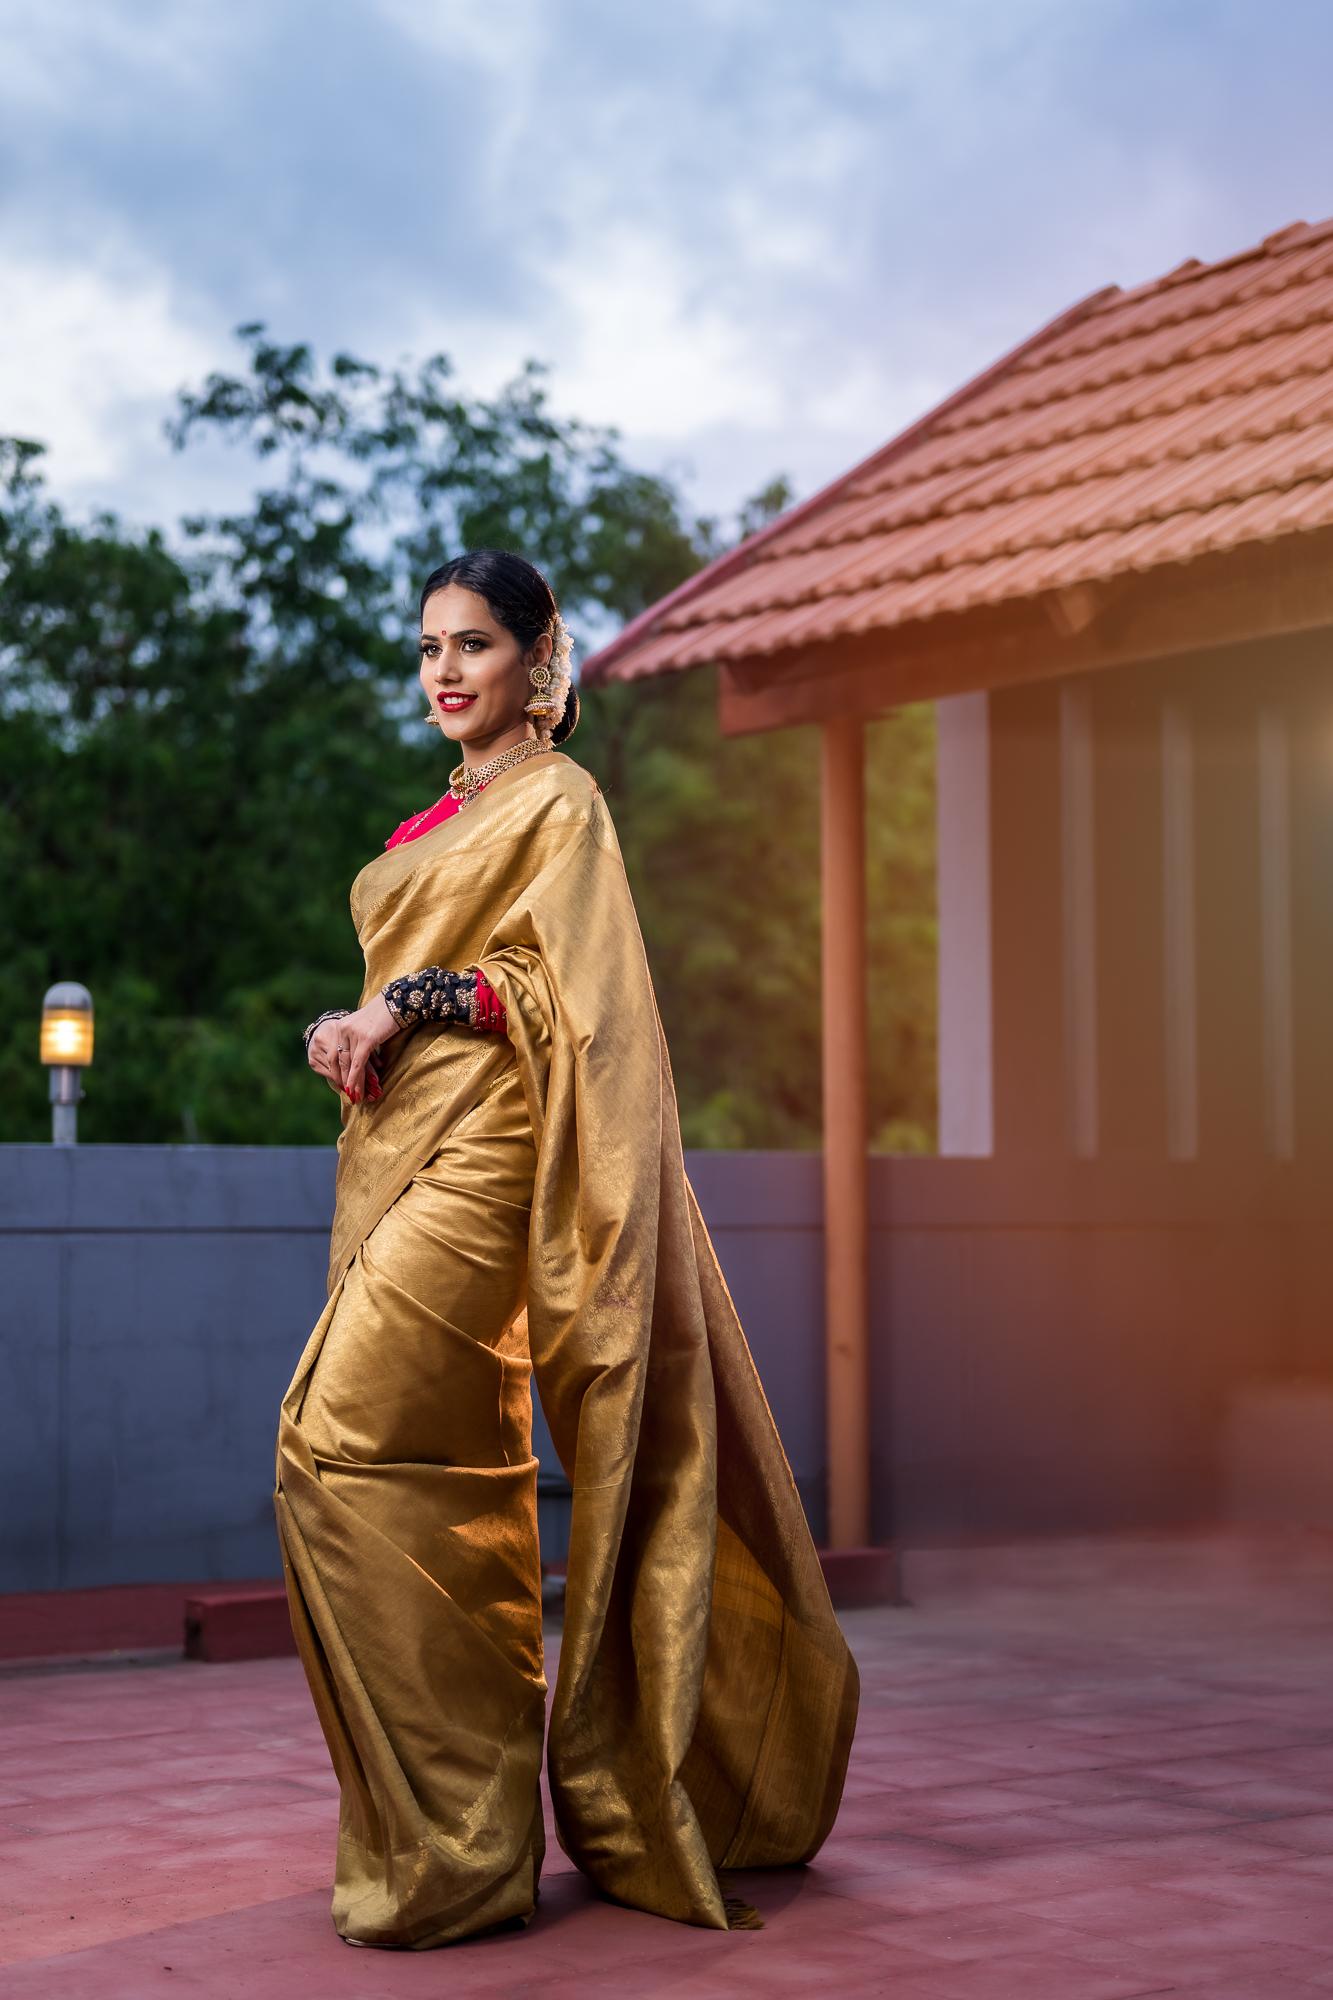 Neeta-Shankar-Photography-Contemporary-Portraits-Traditional-Saree-Portraits